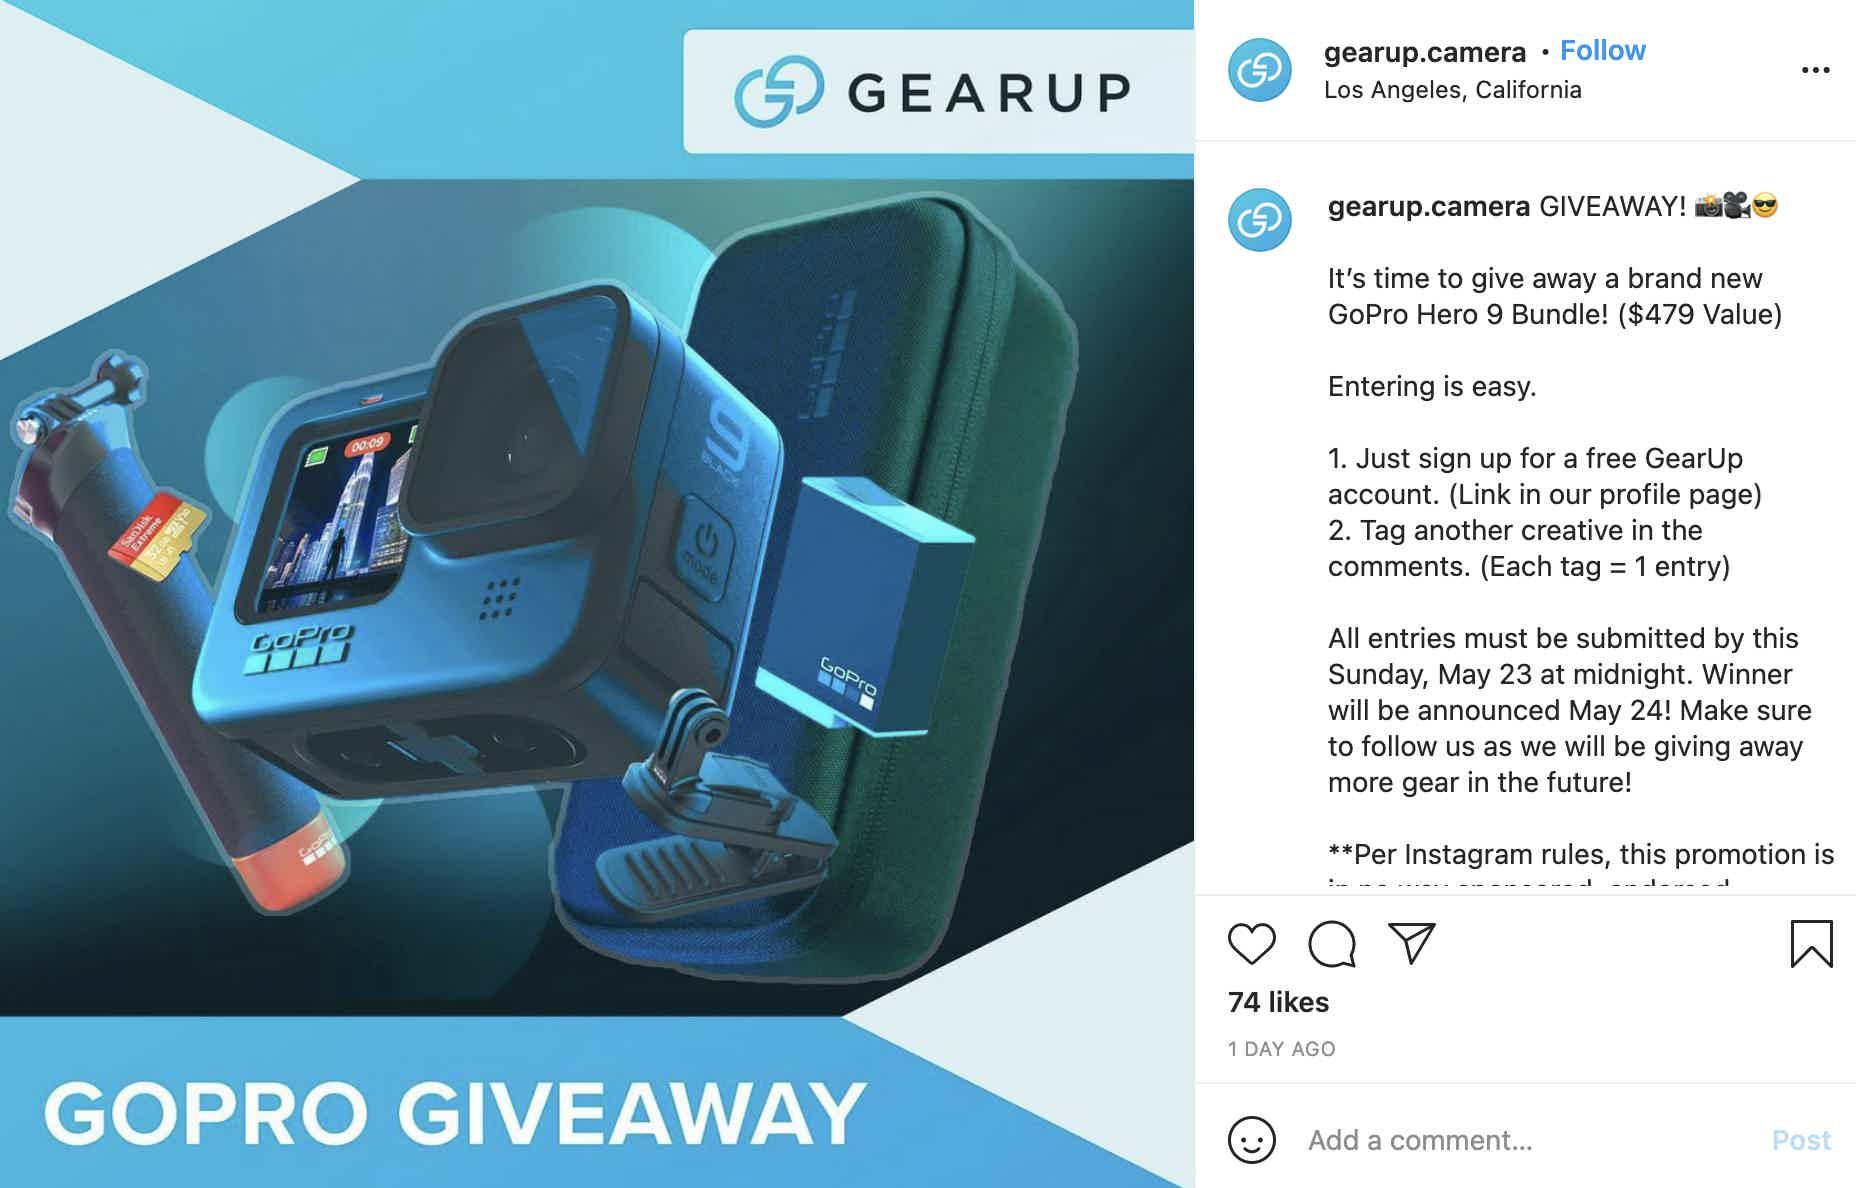 Gearup Camera Giveaway